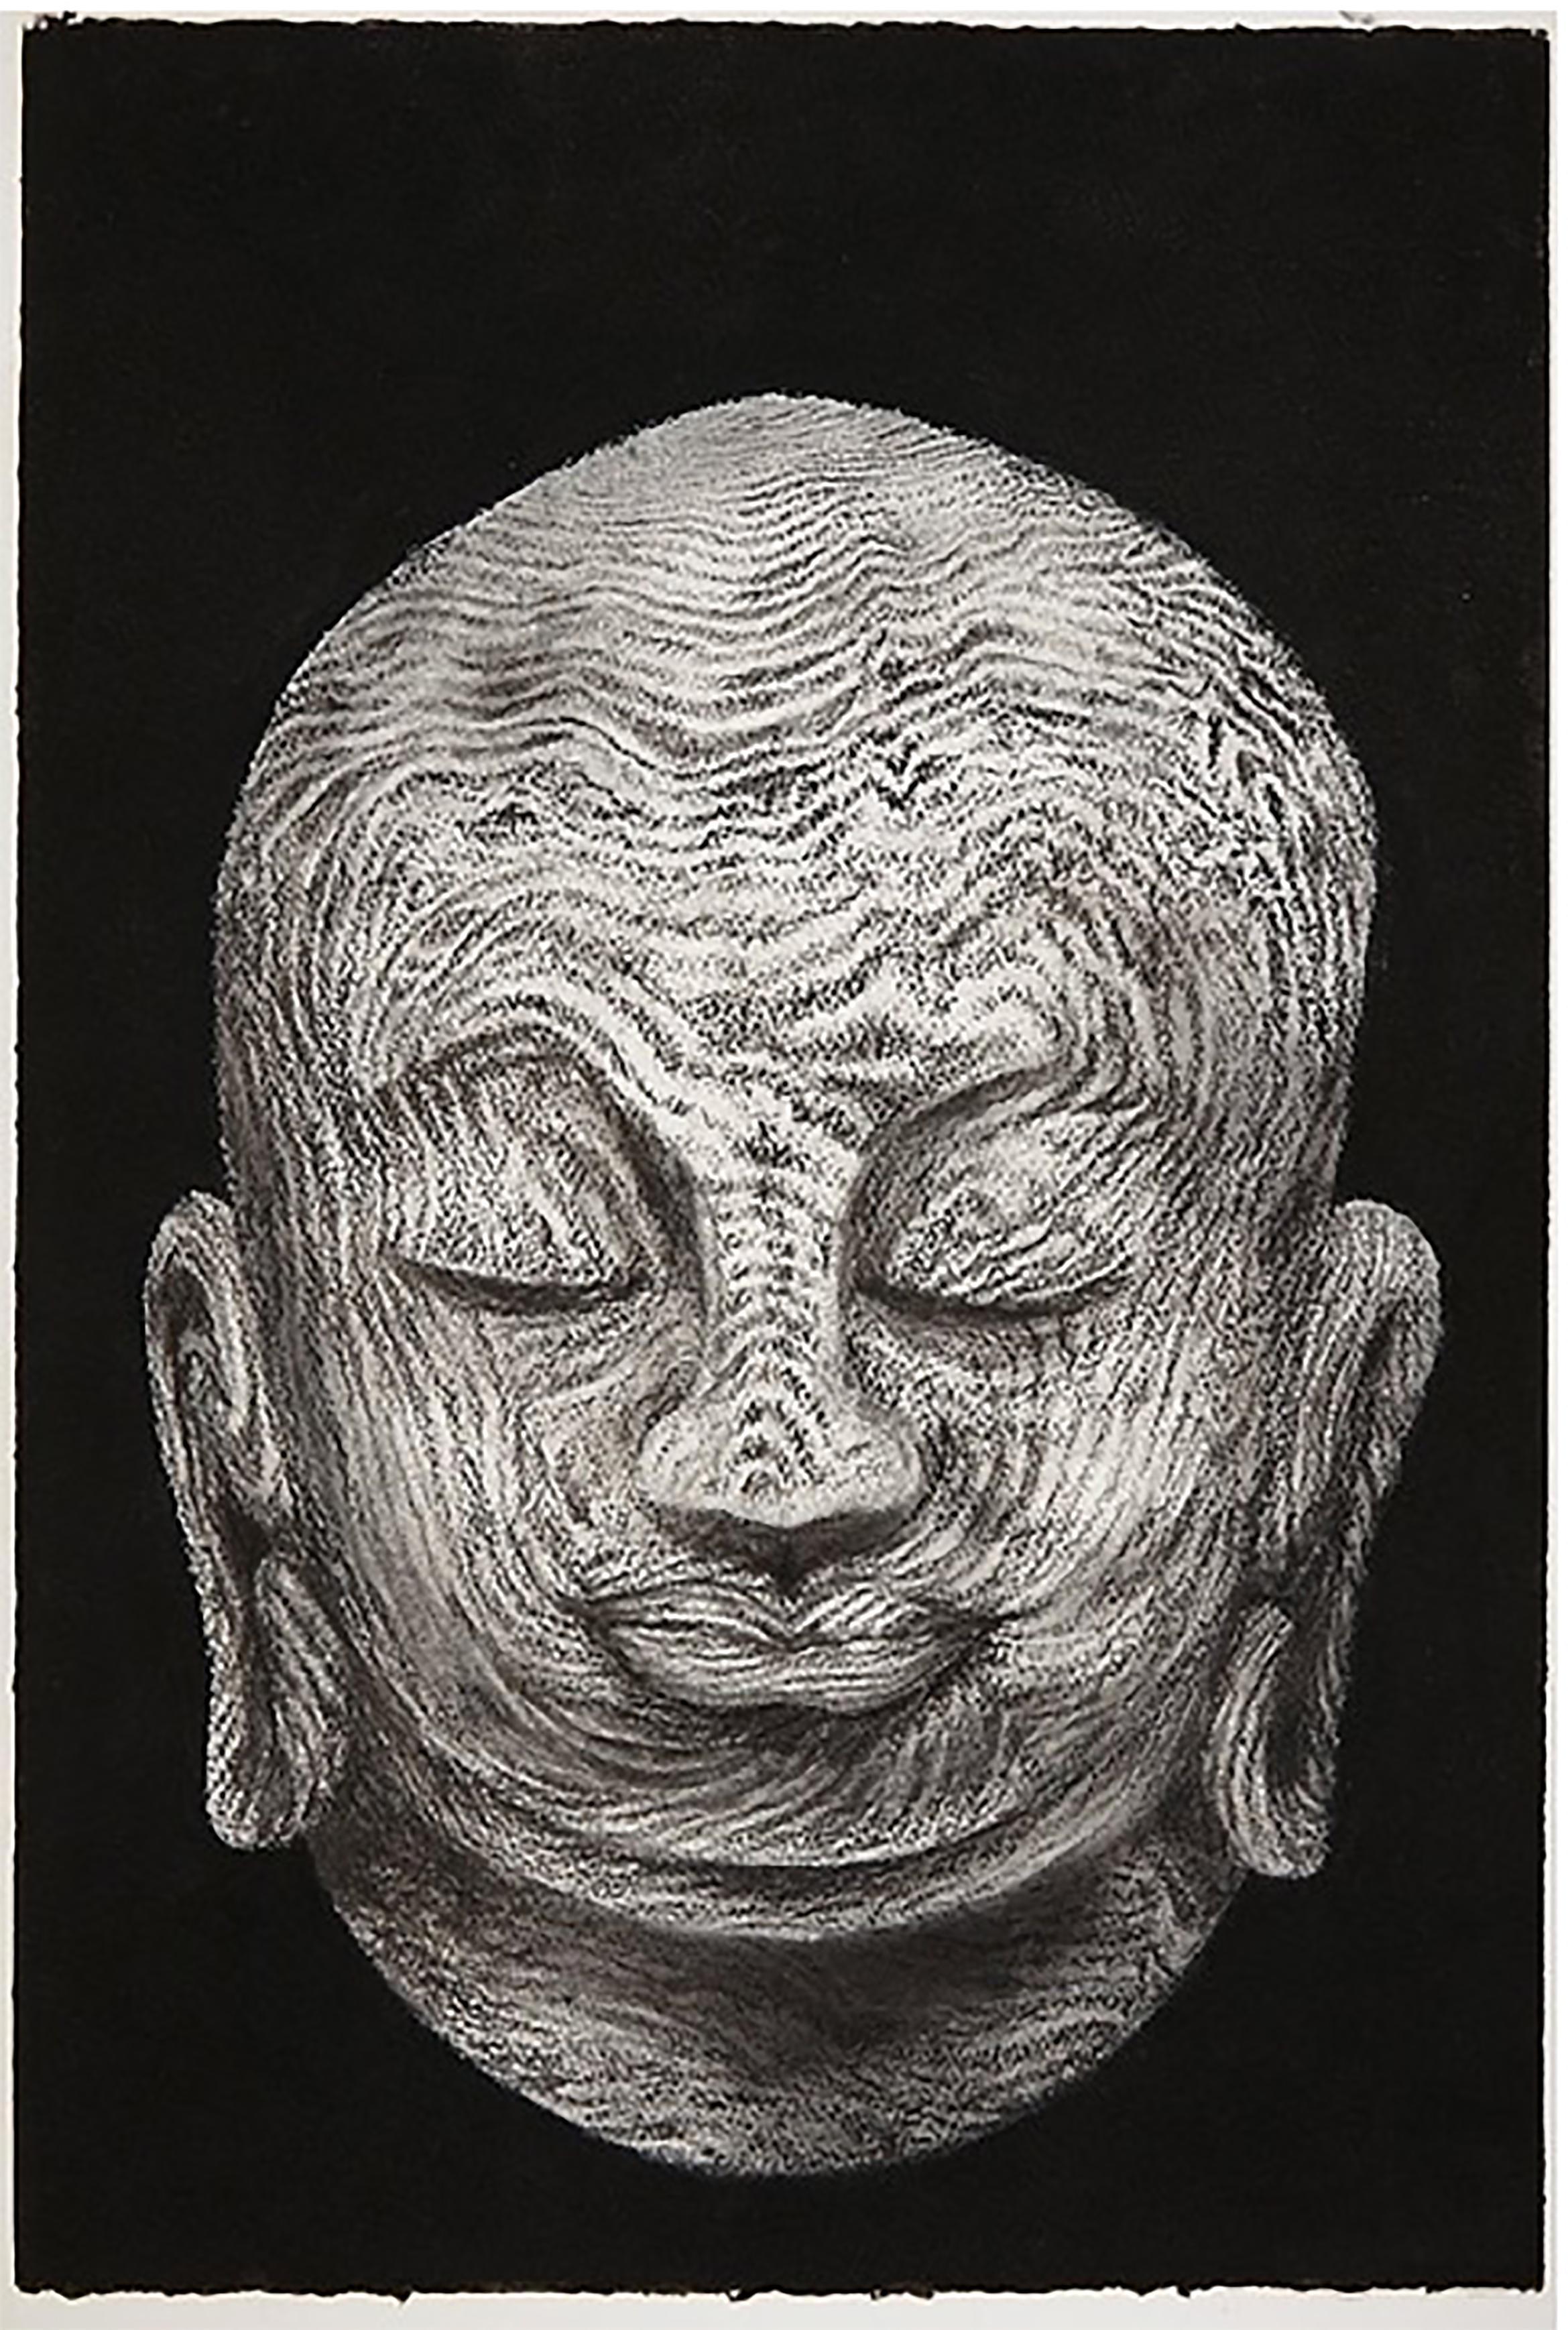 Buddha head 2, 2015, 57x38cm, charcoal on paper